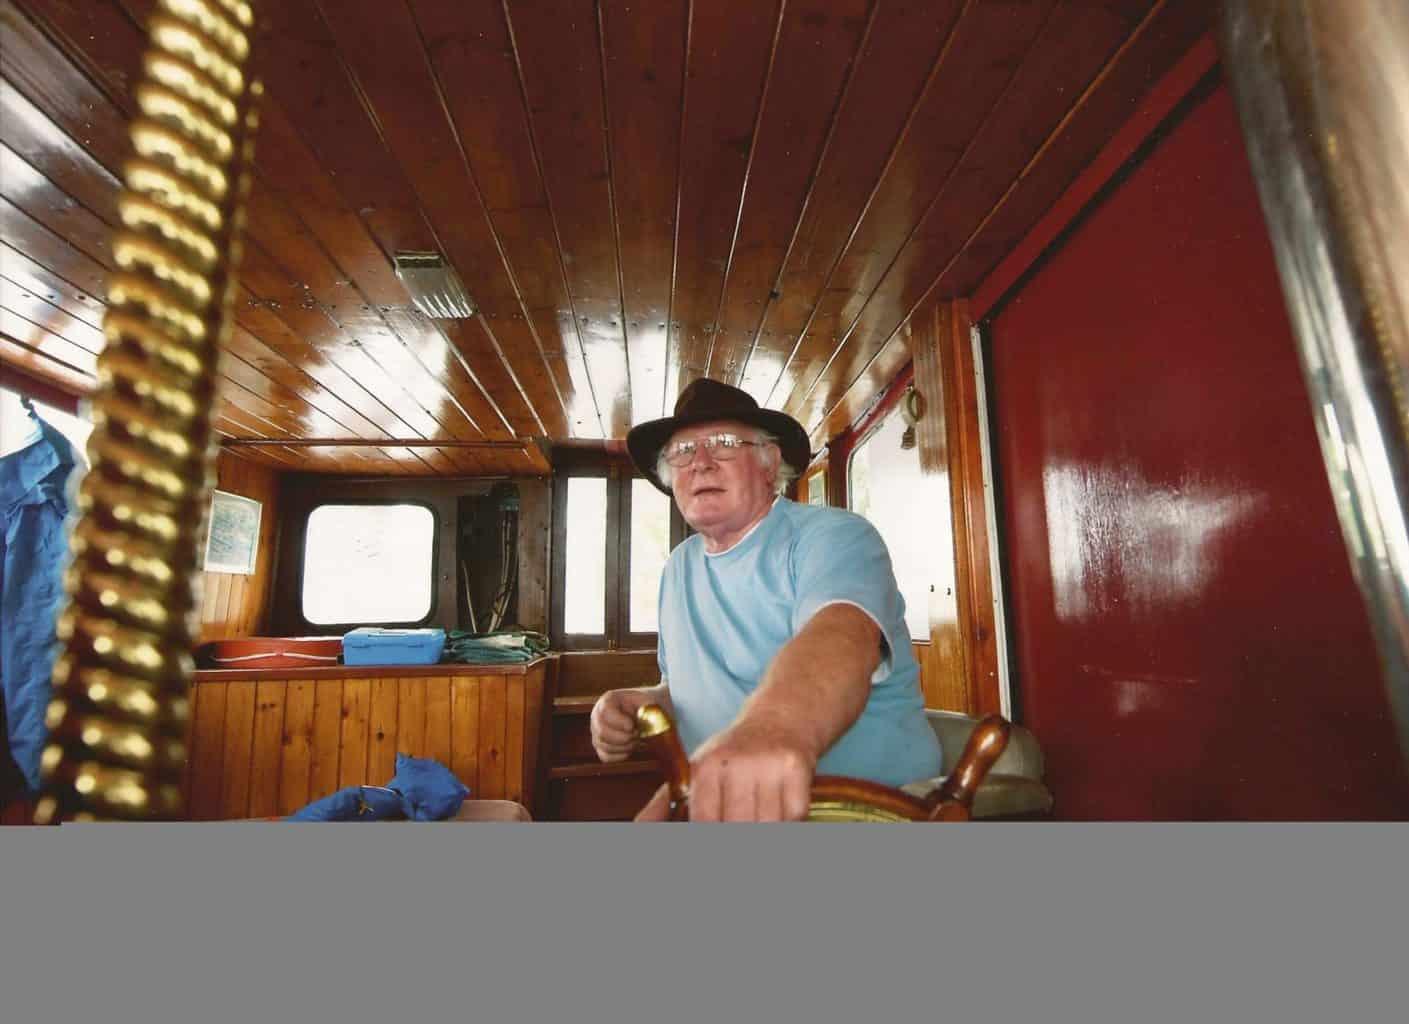 Mick Sitting In A Inside a 1945 Refuller RAF Boat